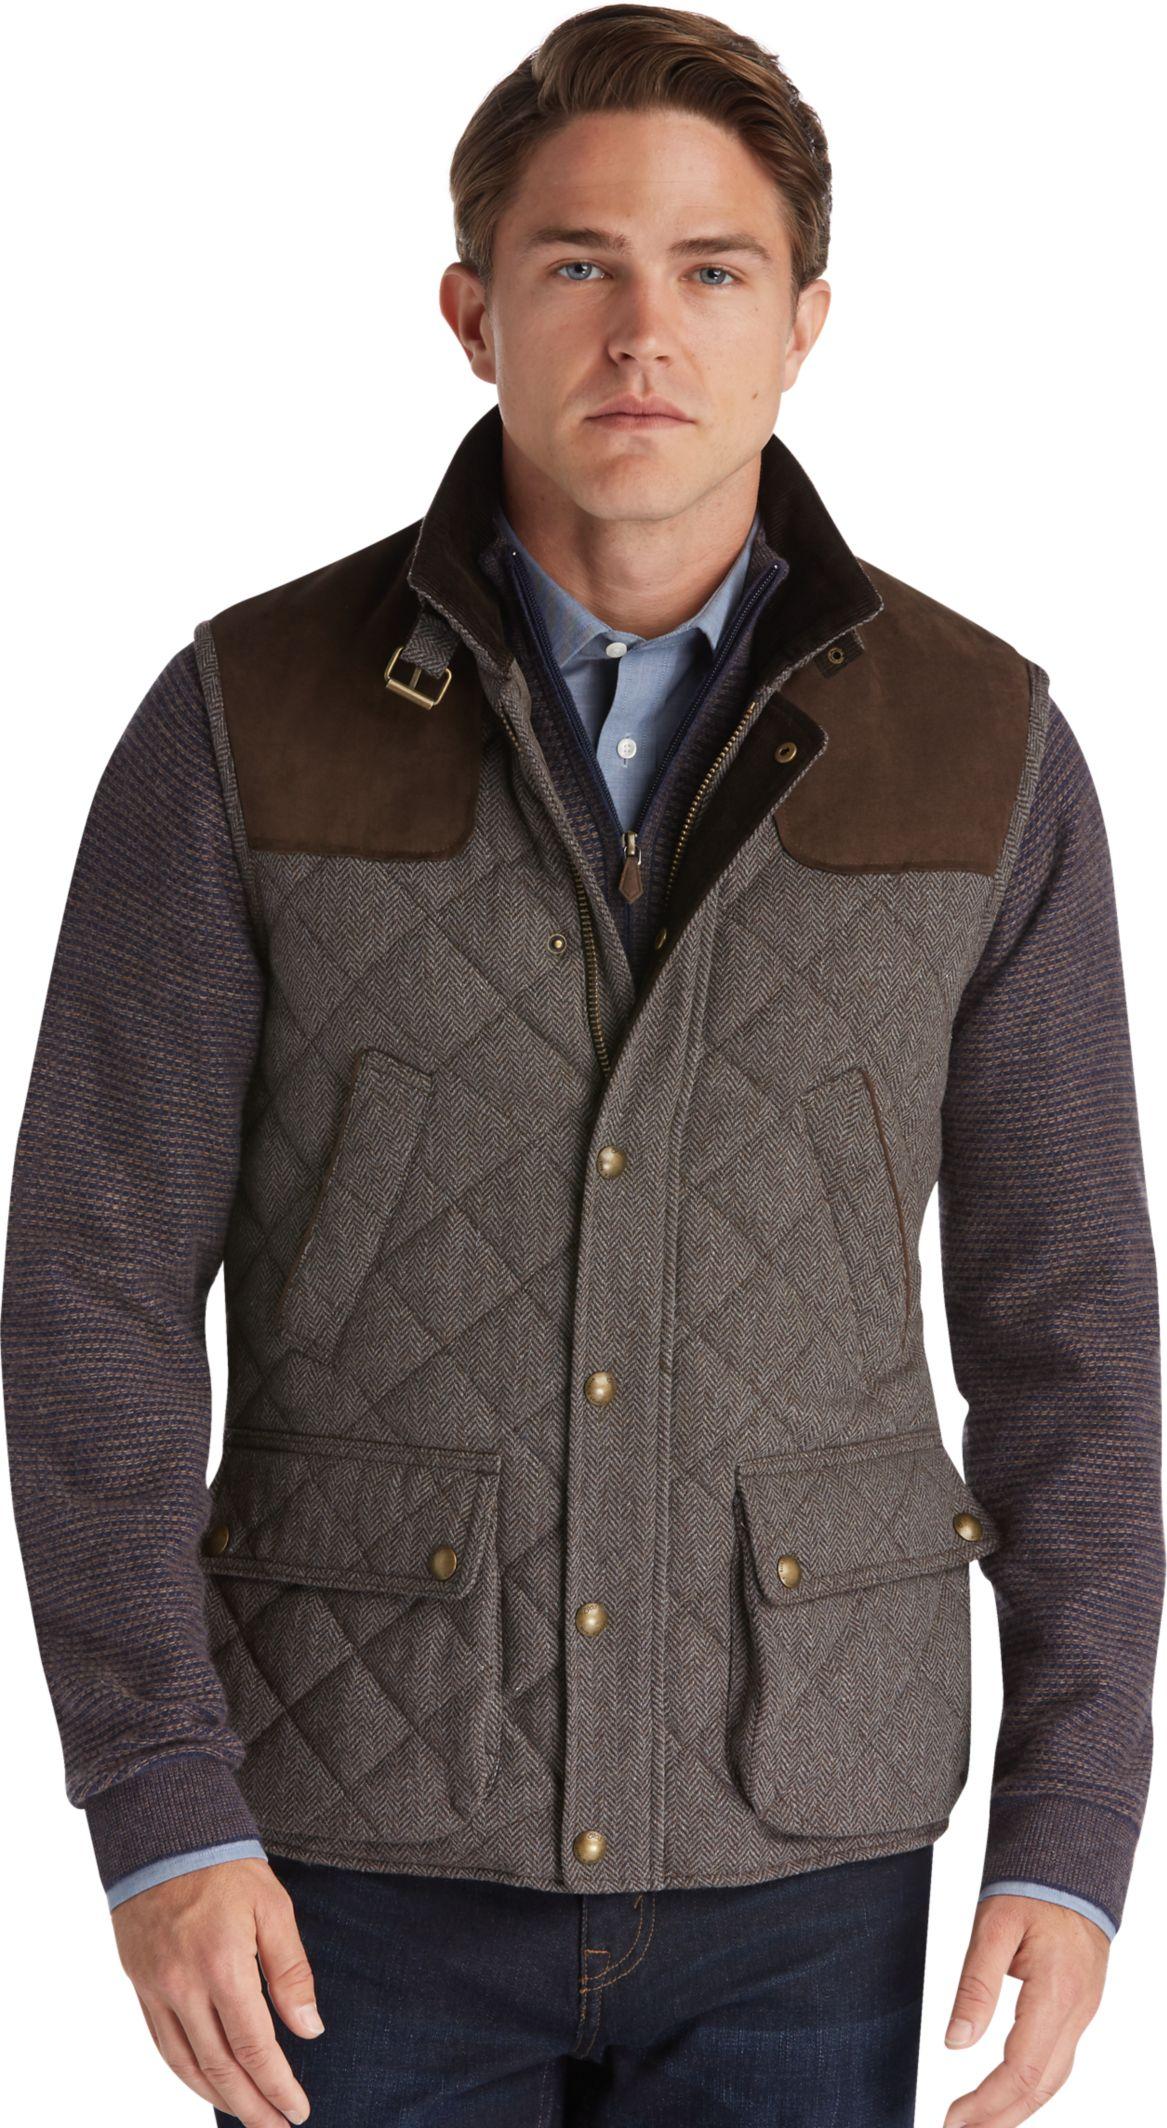 Men&39s Wool Casual Coats &amp Jackets | Men&39s Outerwear | JoS. A. Bank